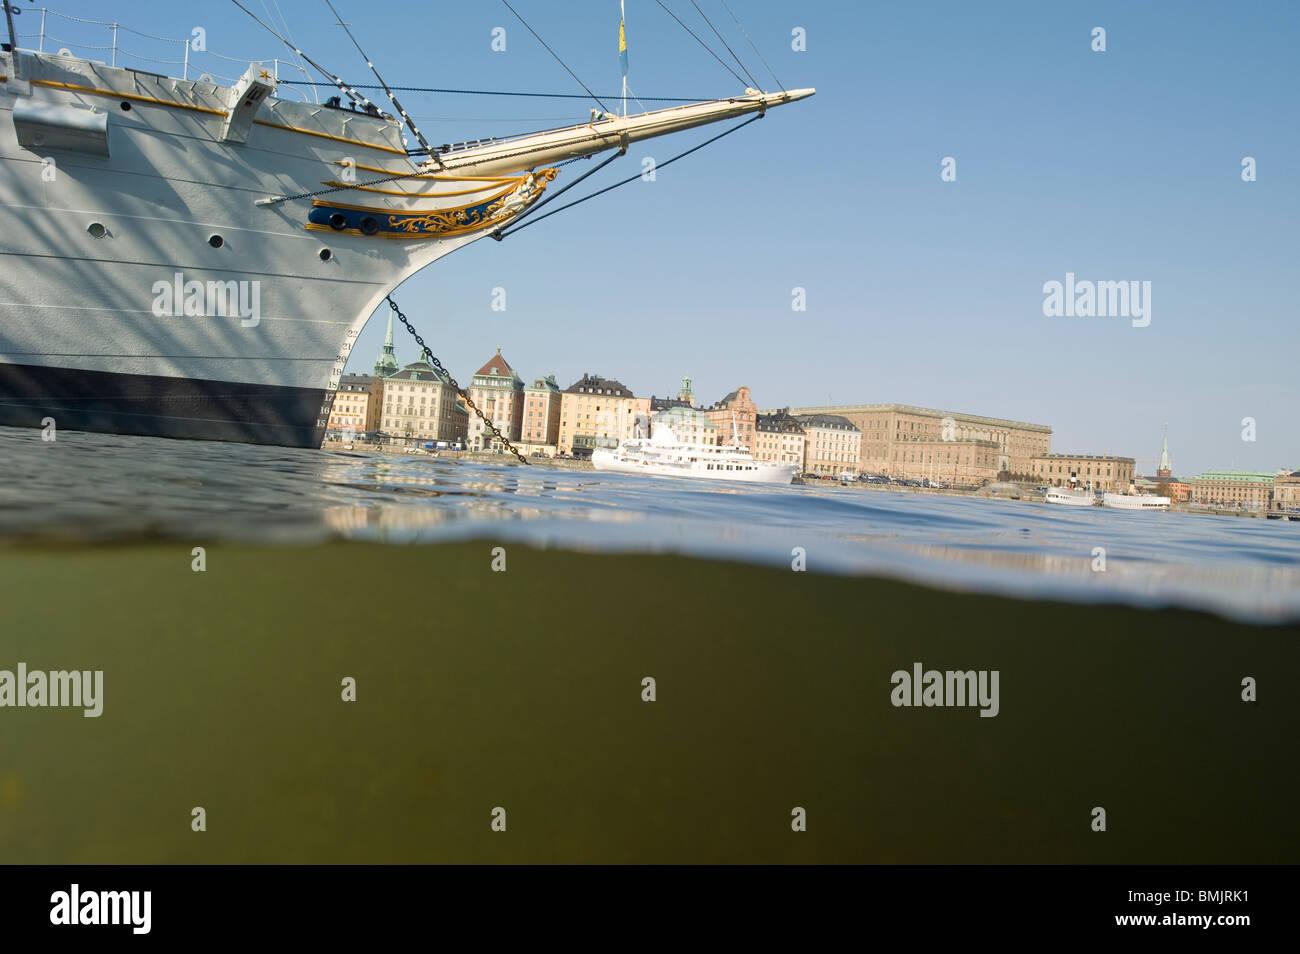 Ein Schiff in Stockholm Stockbild